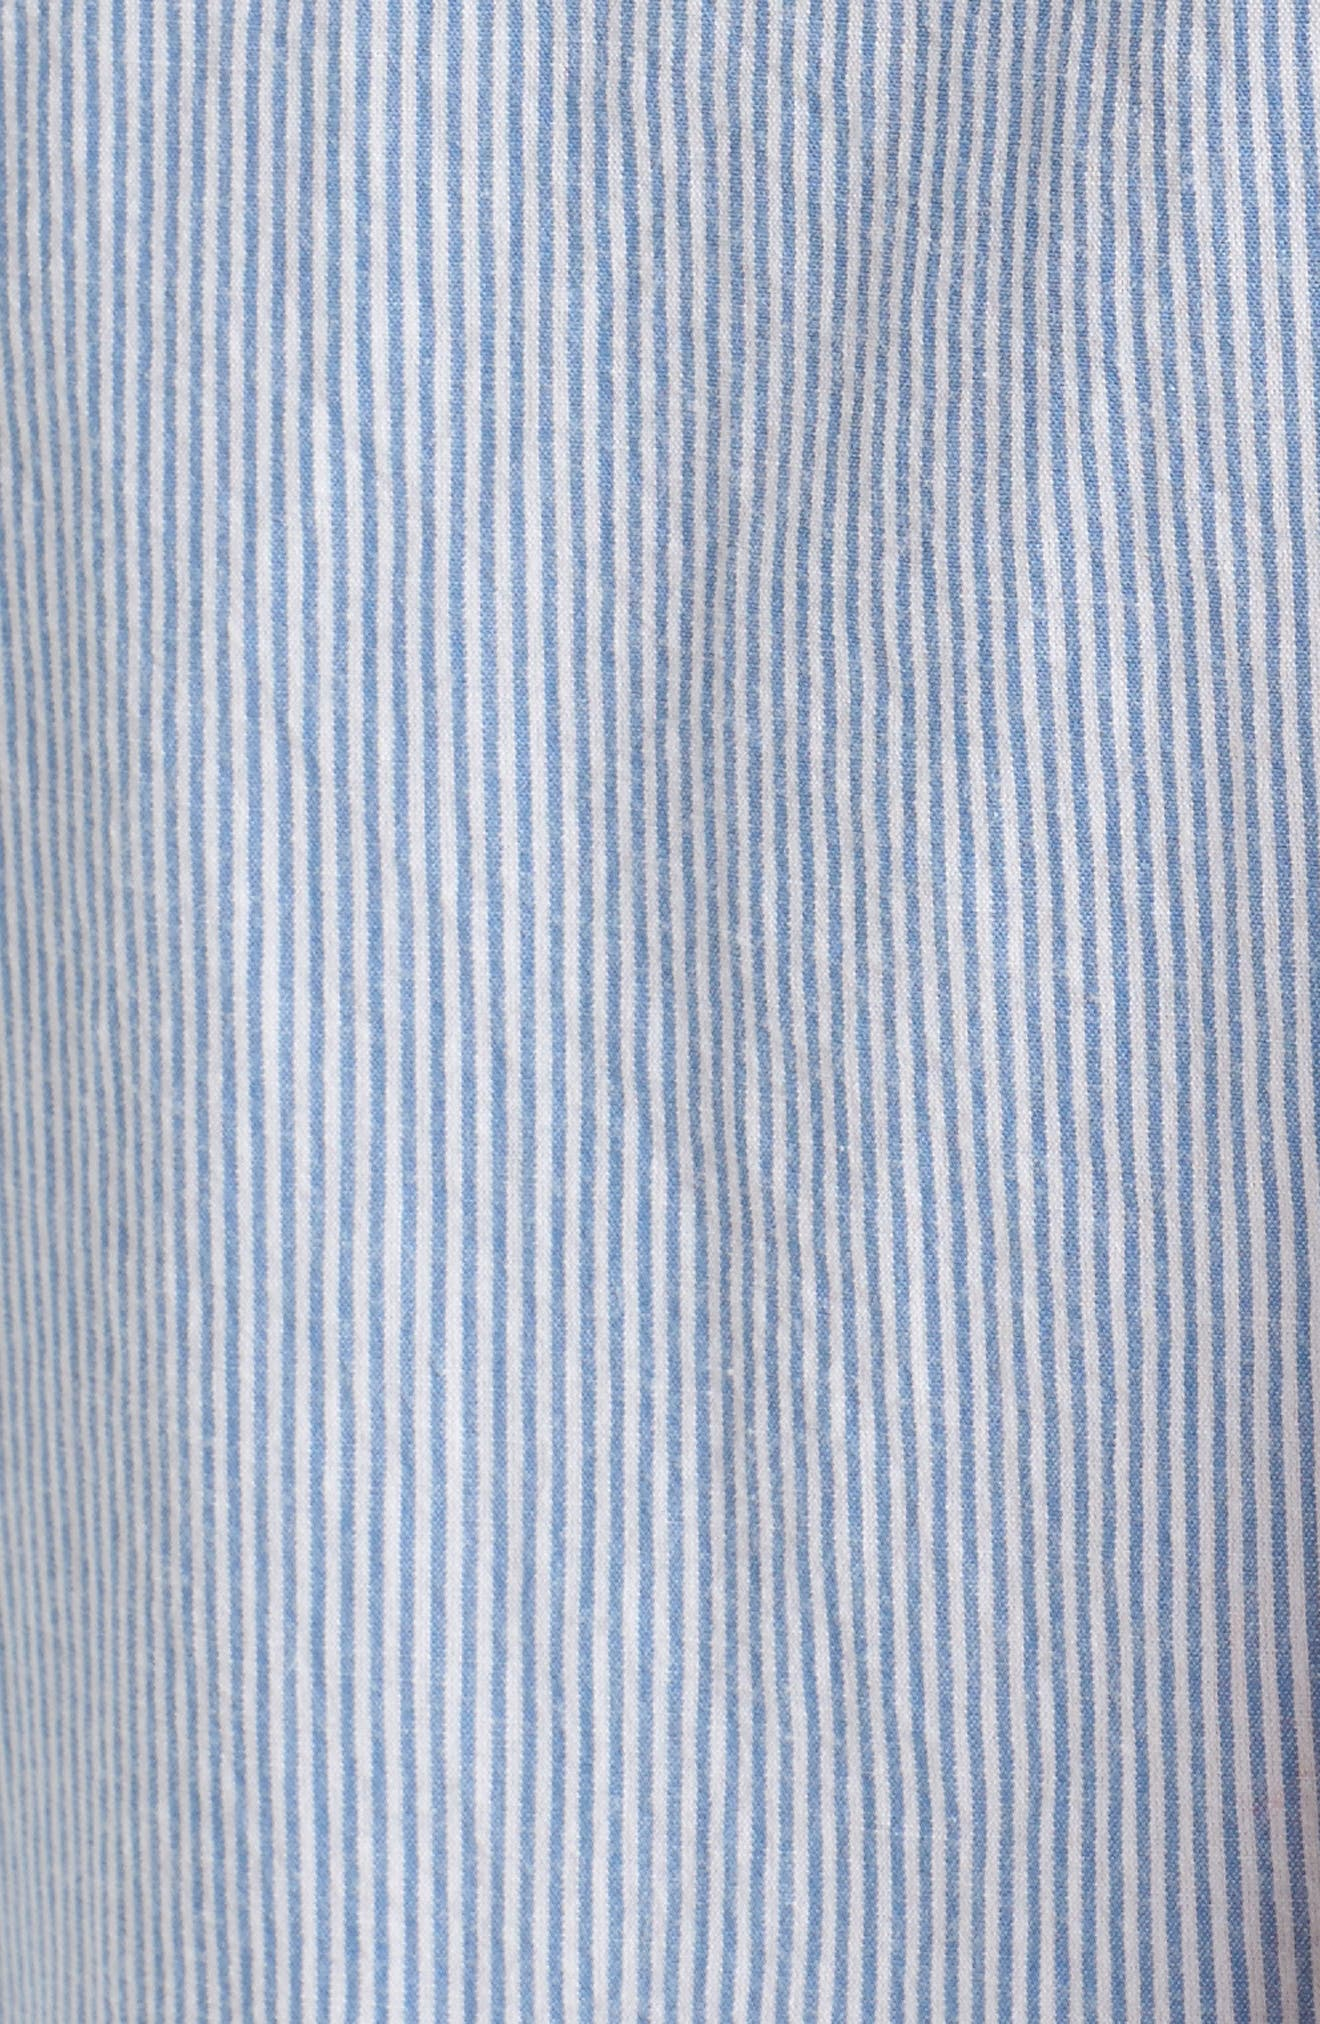 Tie Sleeve Blouse,                             Alternate thumbnail 5, color,                             Blue Tw Jny Stp